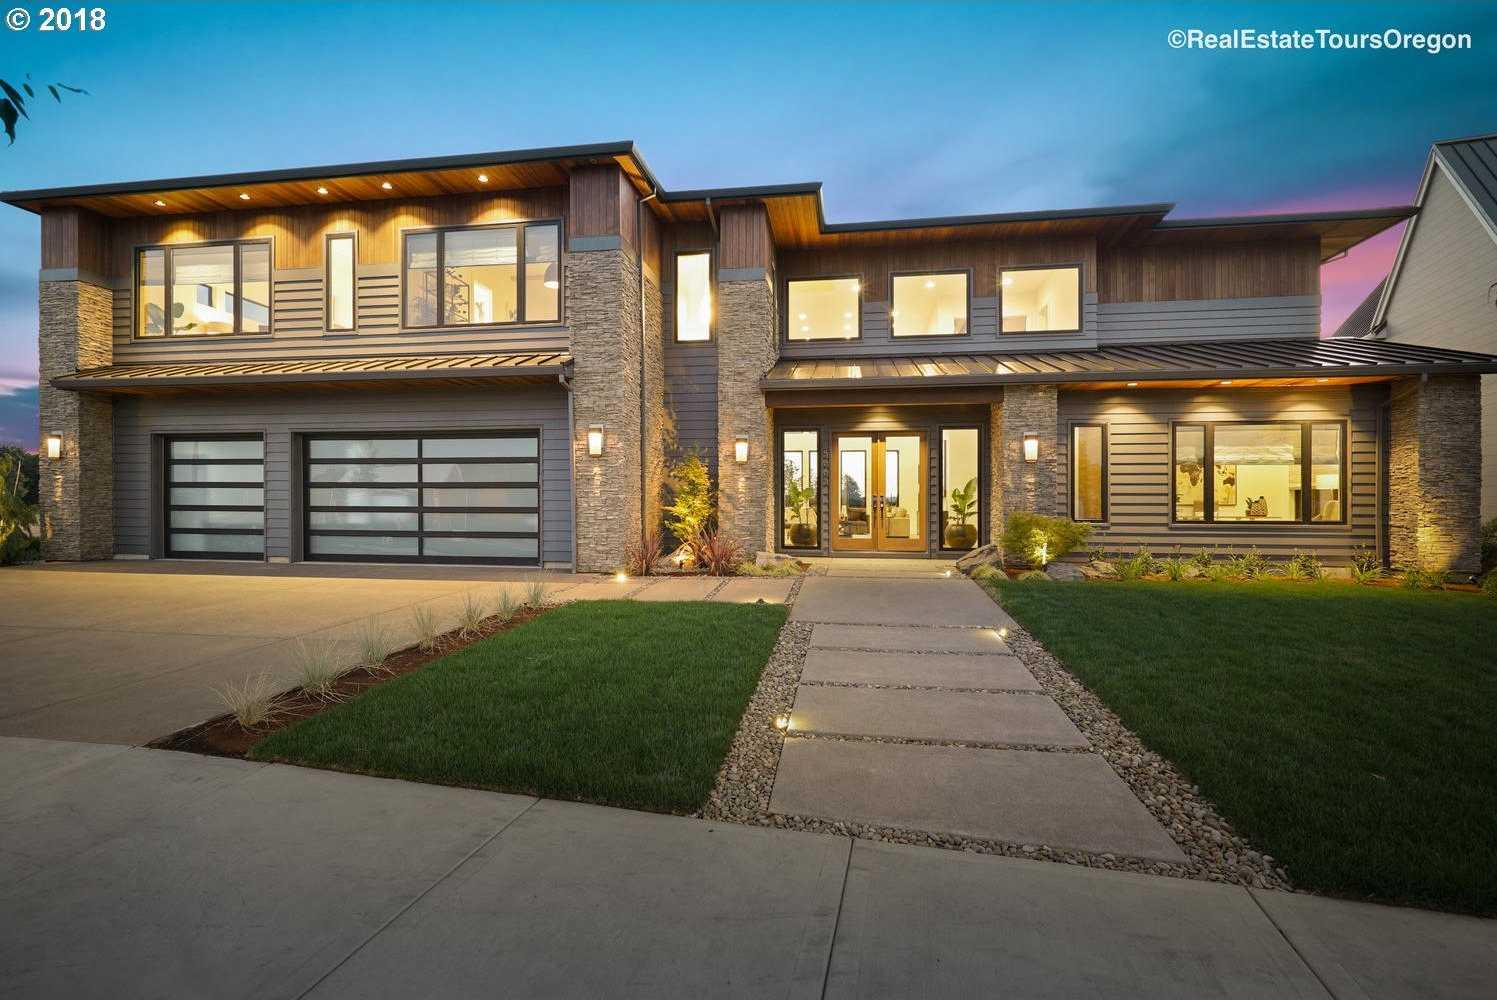 $2,050,000 - 4Br/5Ba -  for Sale in Hillsboro